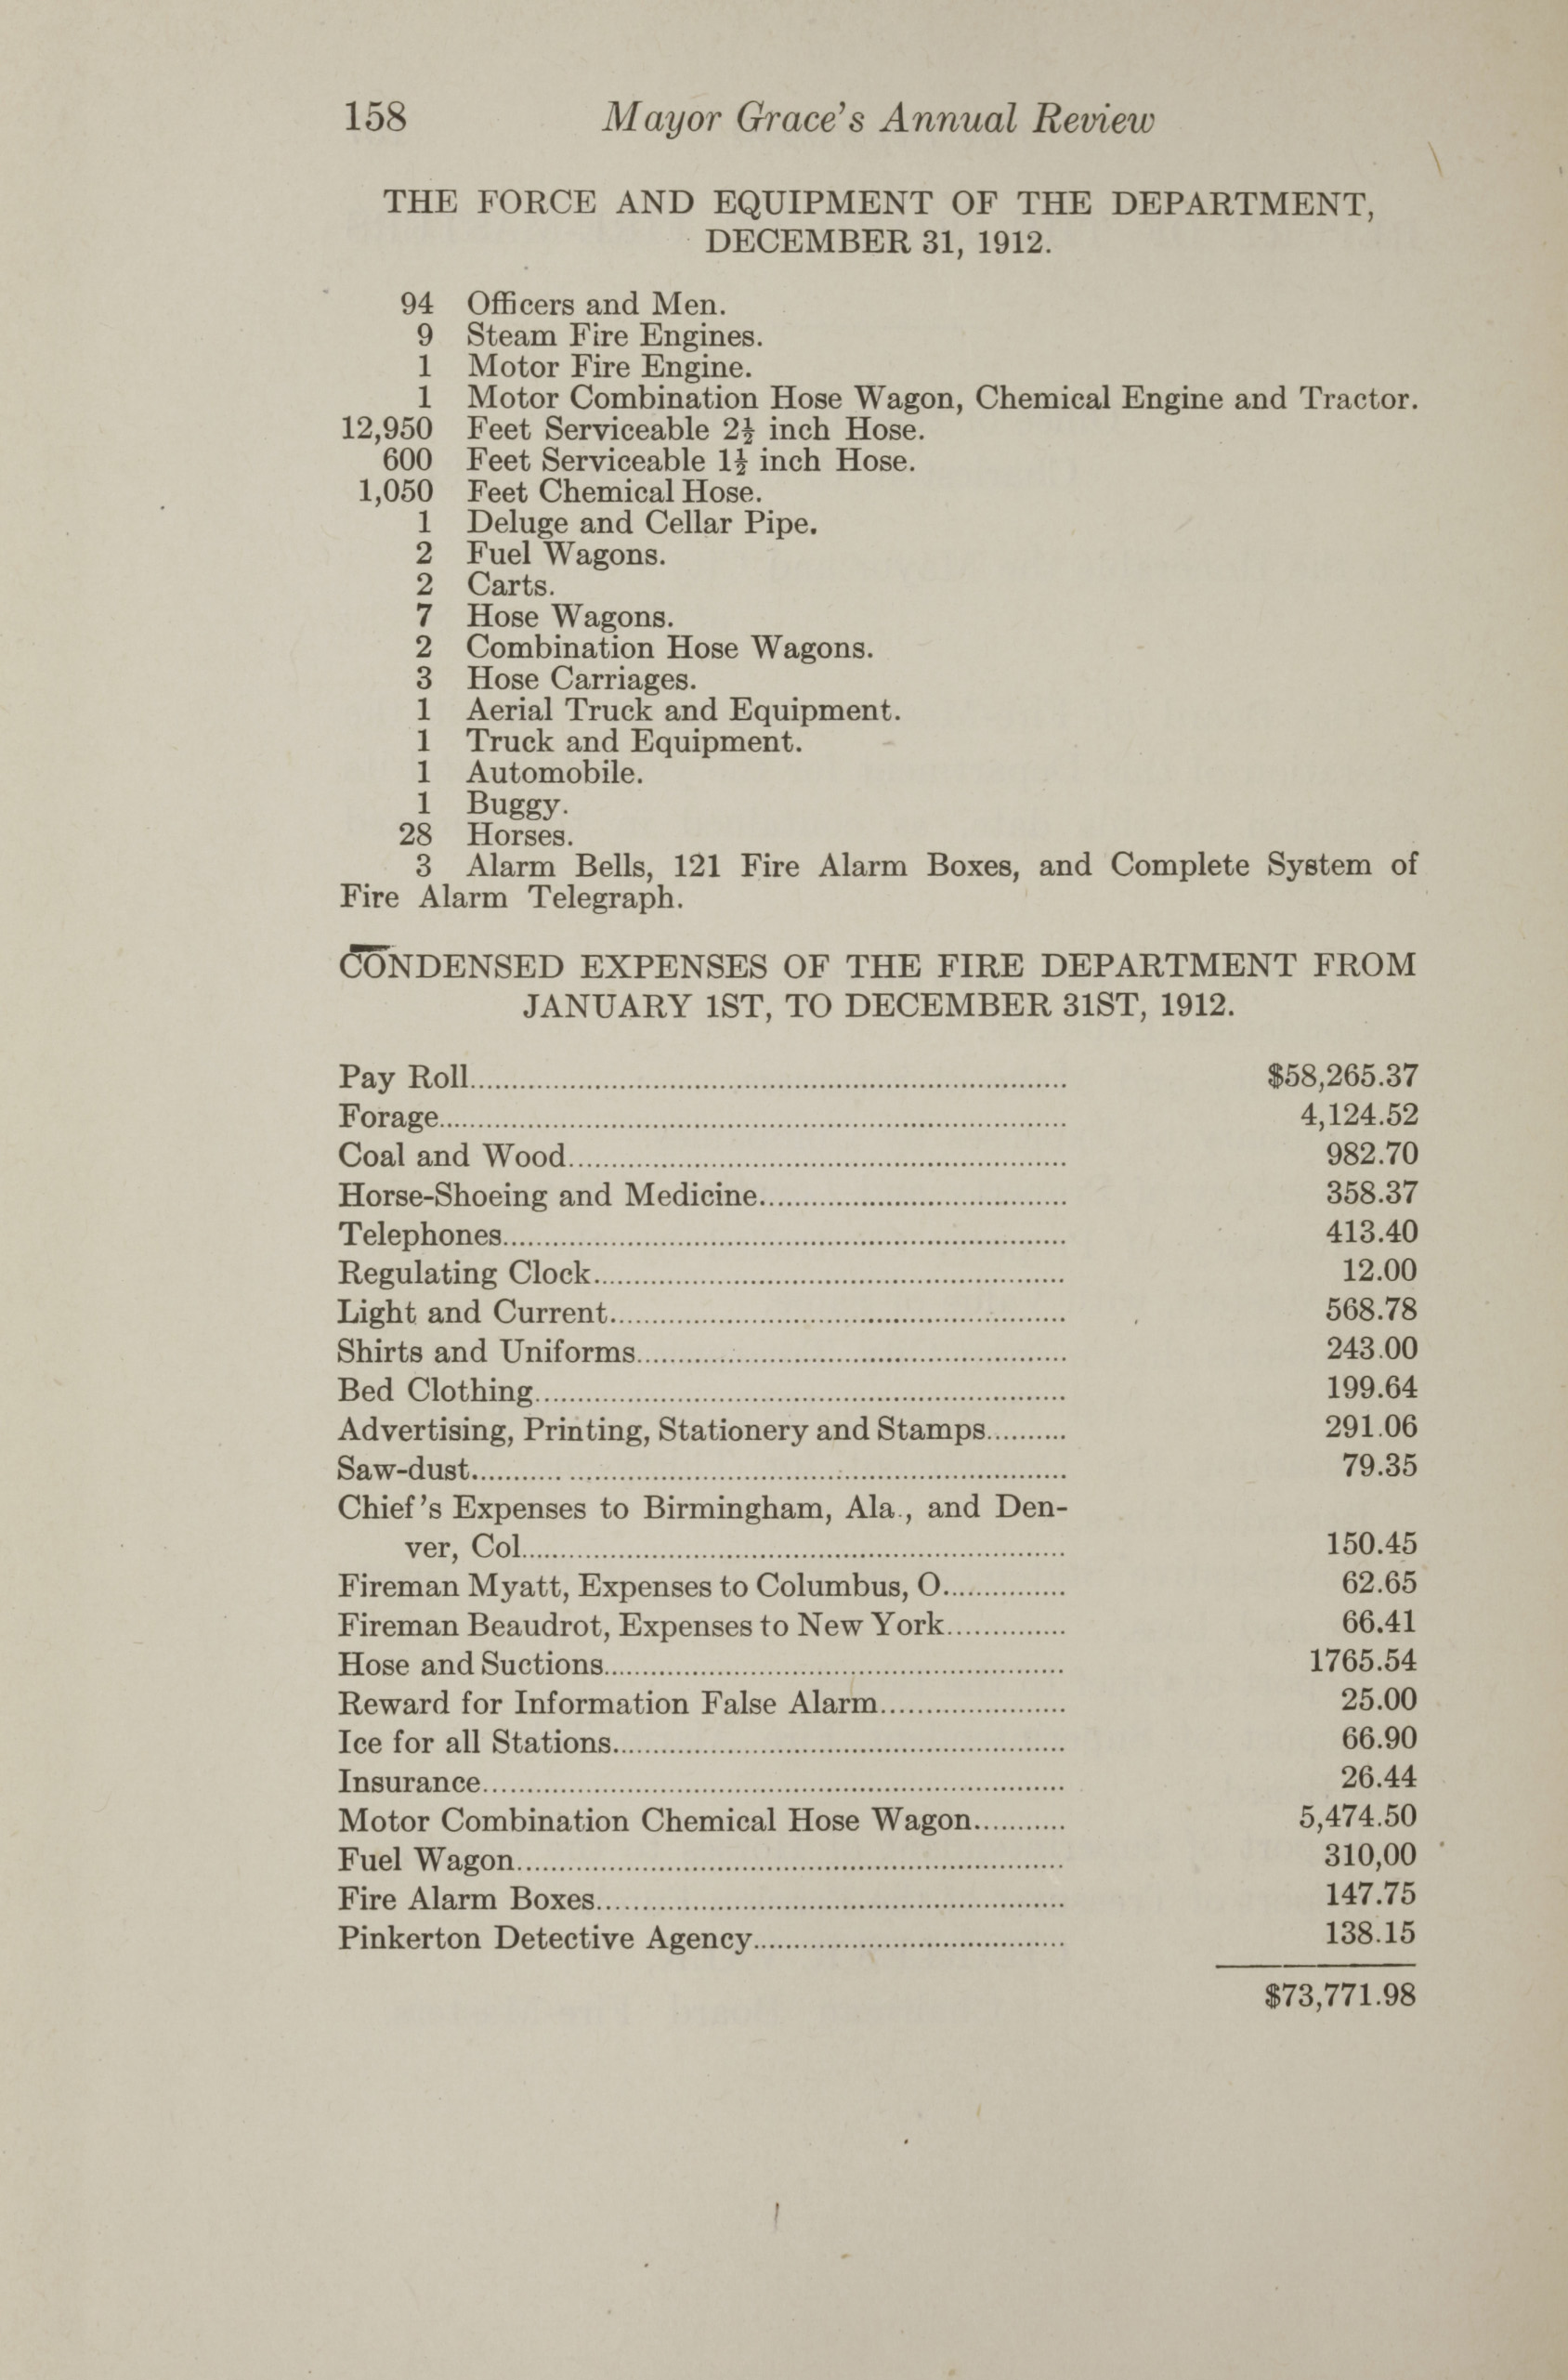 Charleston Yearbook, 1912, page 158